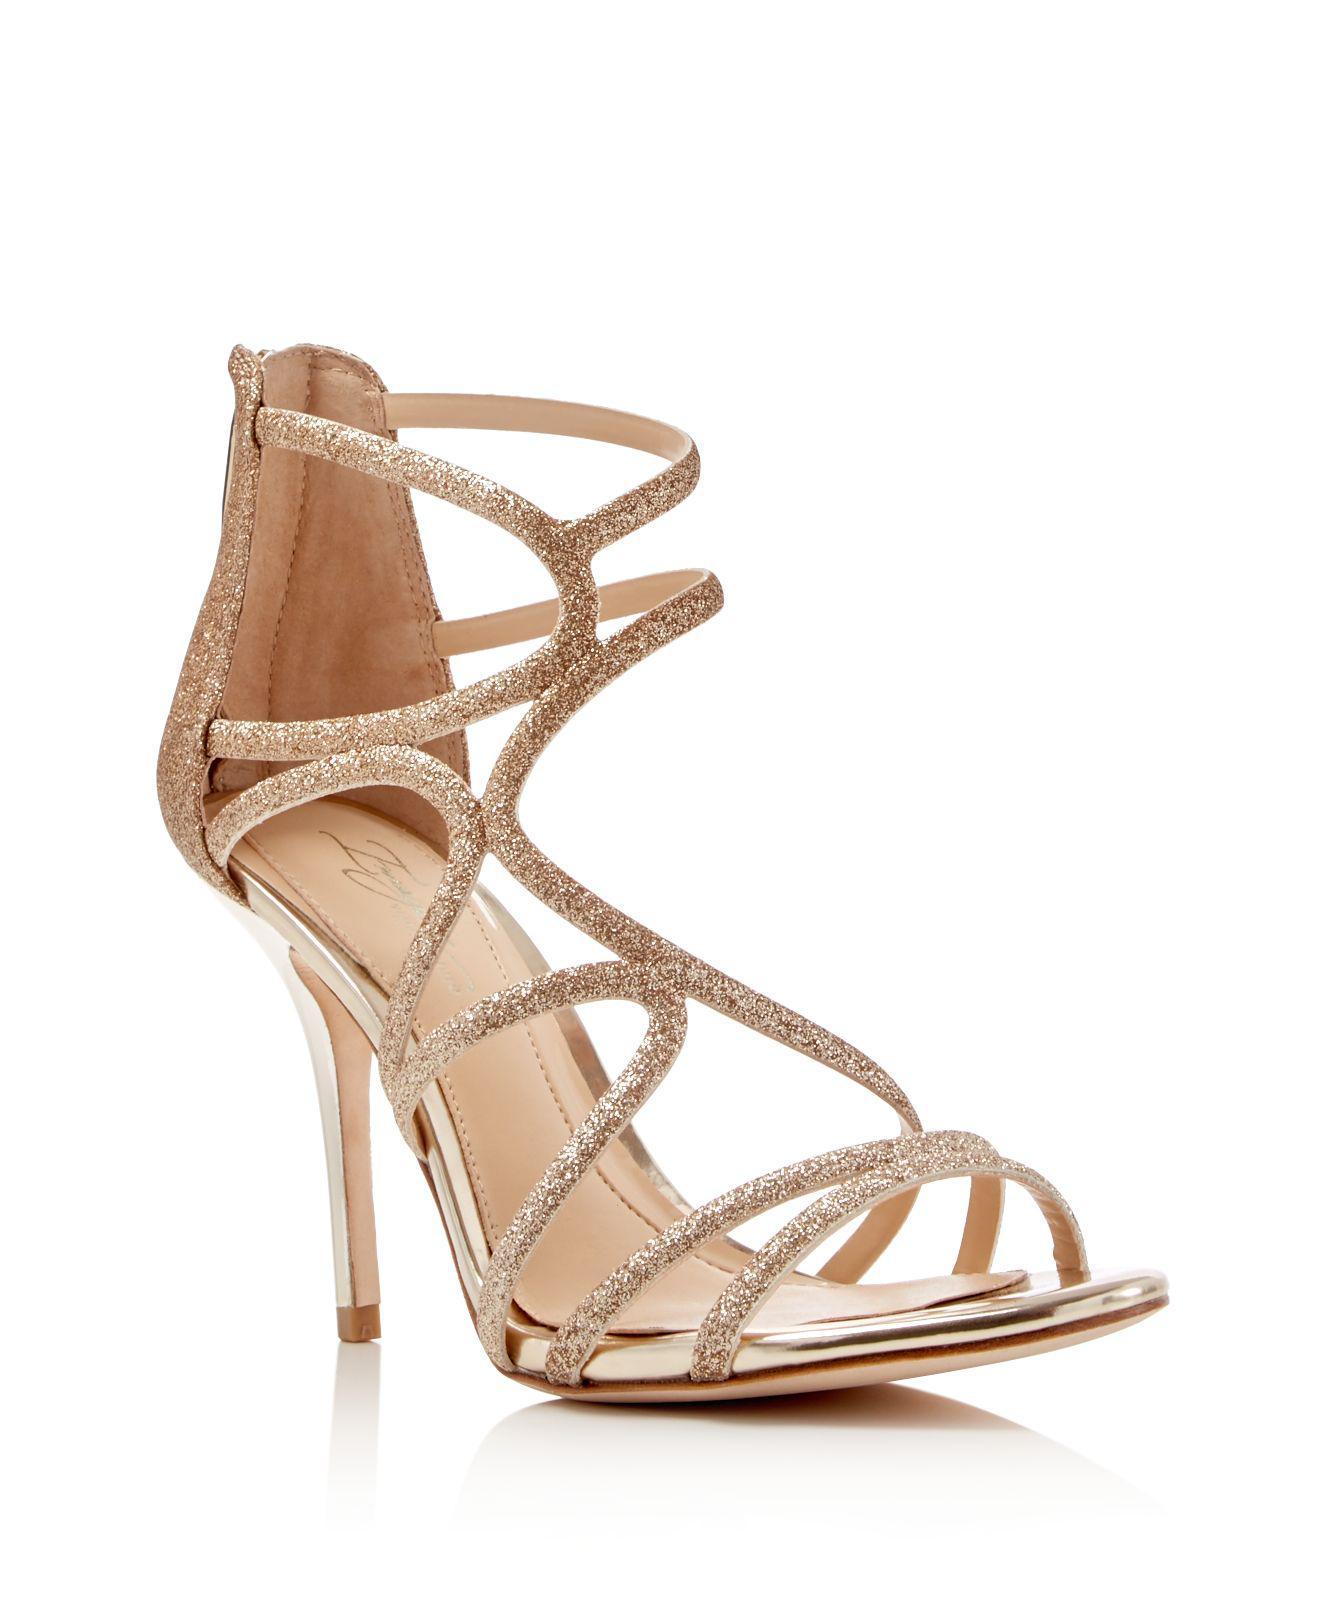 0408f1122a2 Imagine Vince Camuto Ranee Glitter Strappy Sandals in Metallic - Lyst